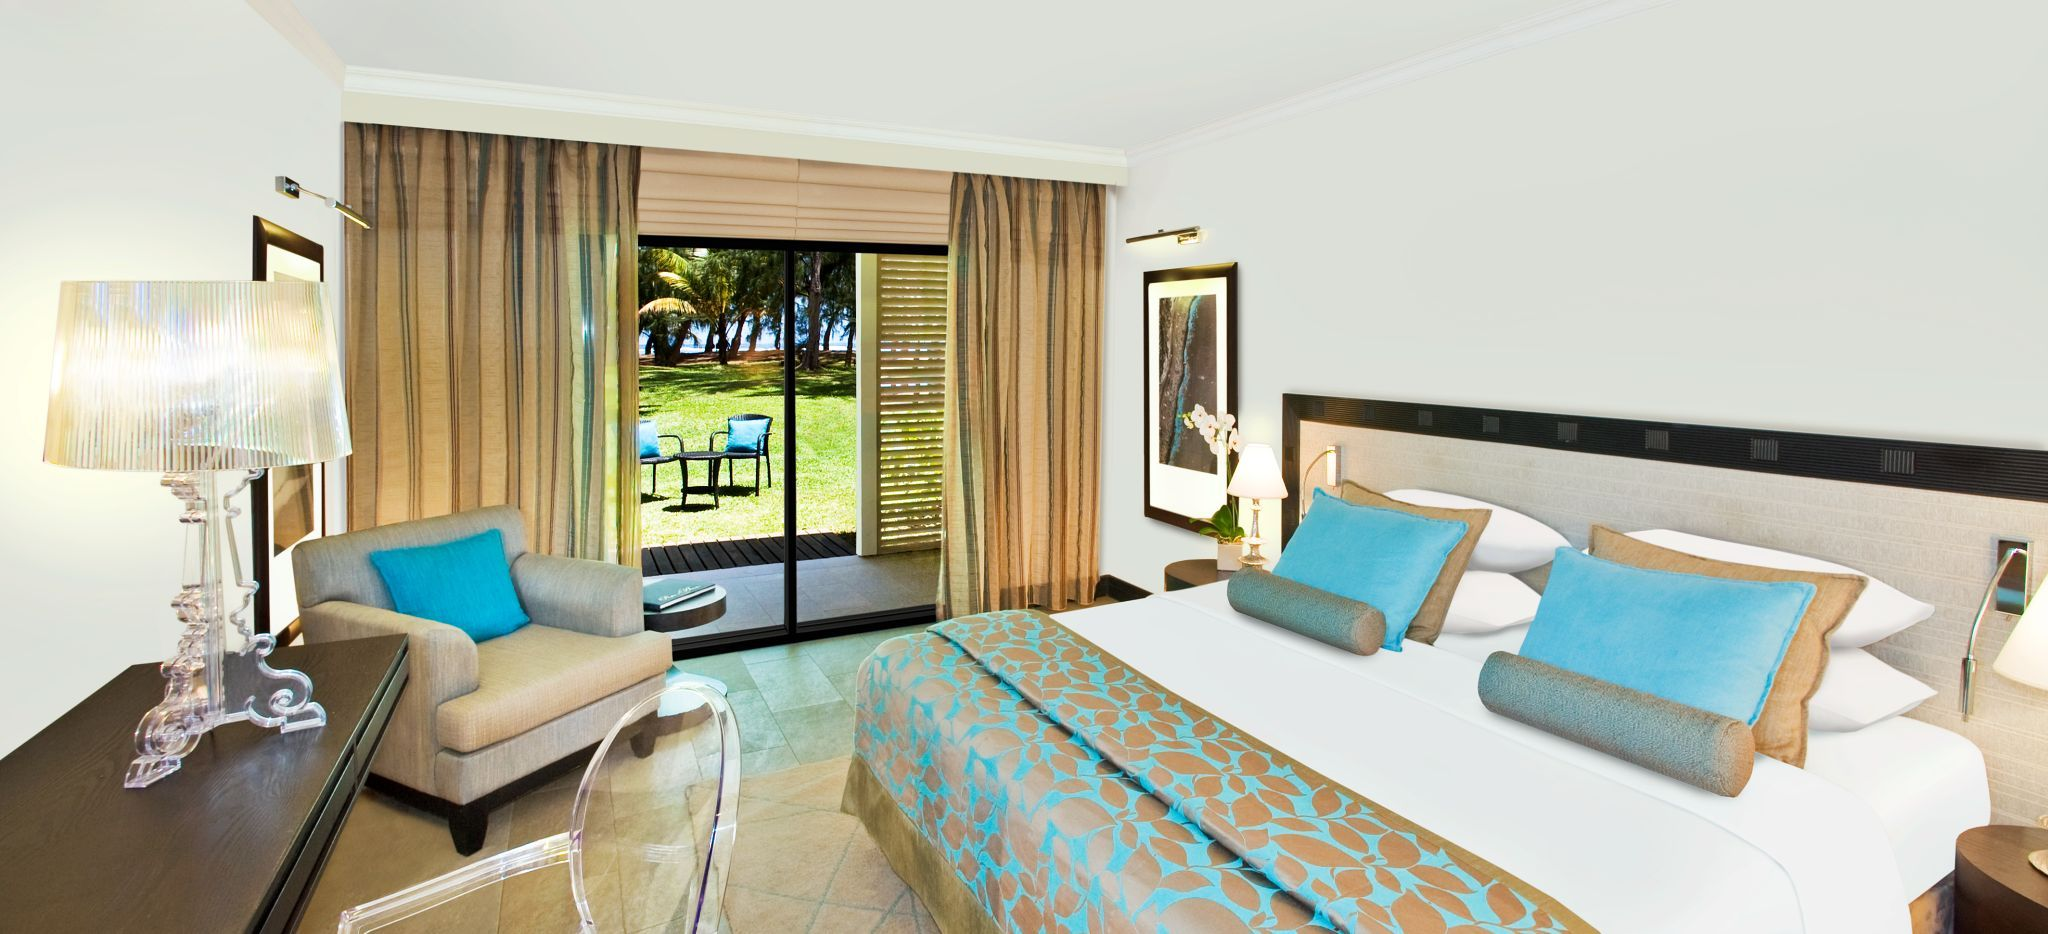 Hotelzimmer der Kategorie Superior Room Im Hotel LUX* Saint Gilles